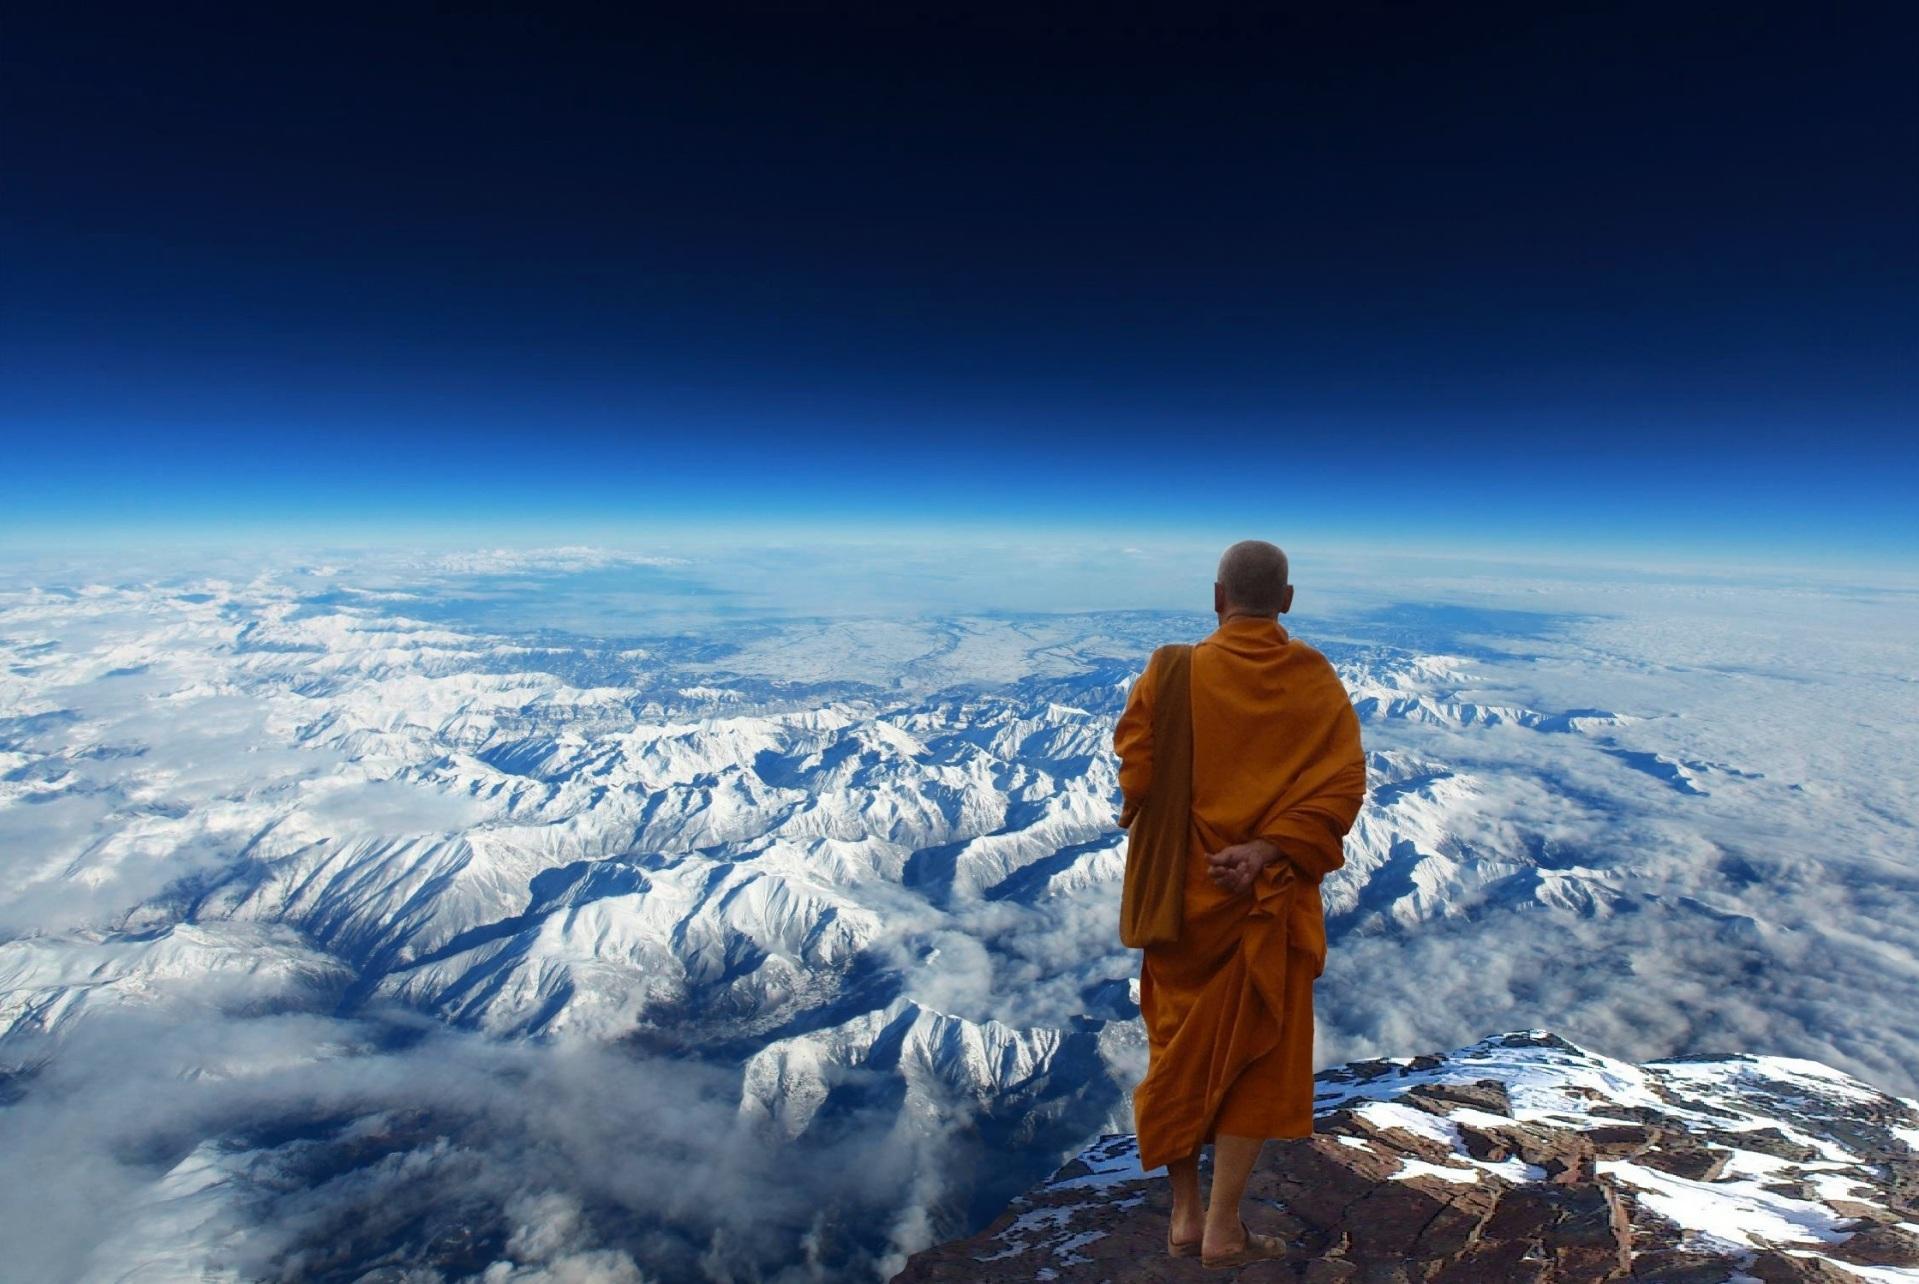 buddhist-737274